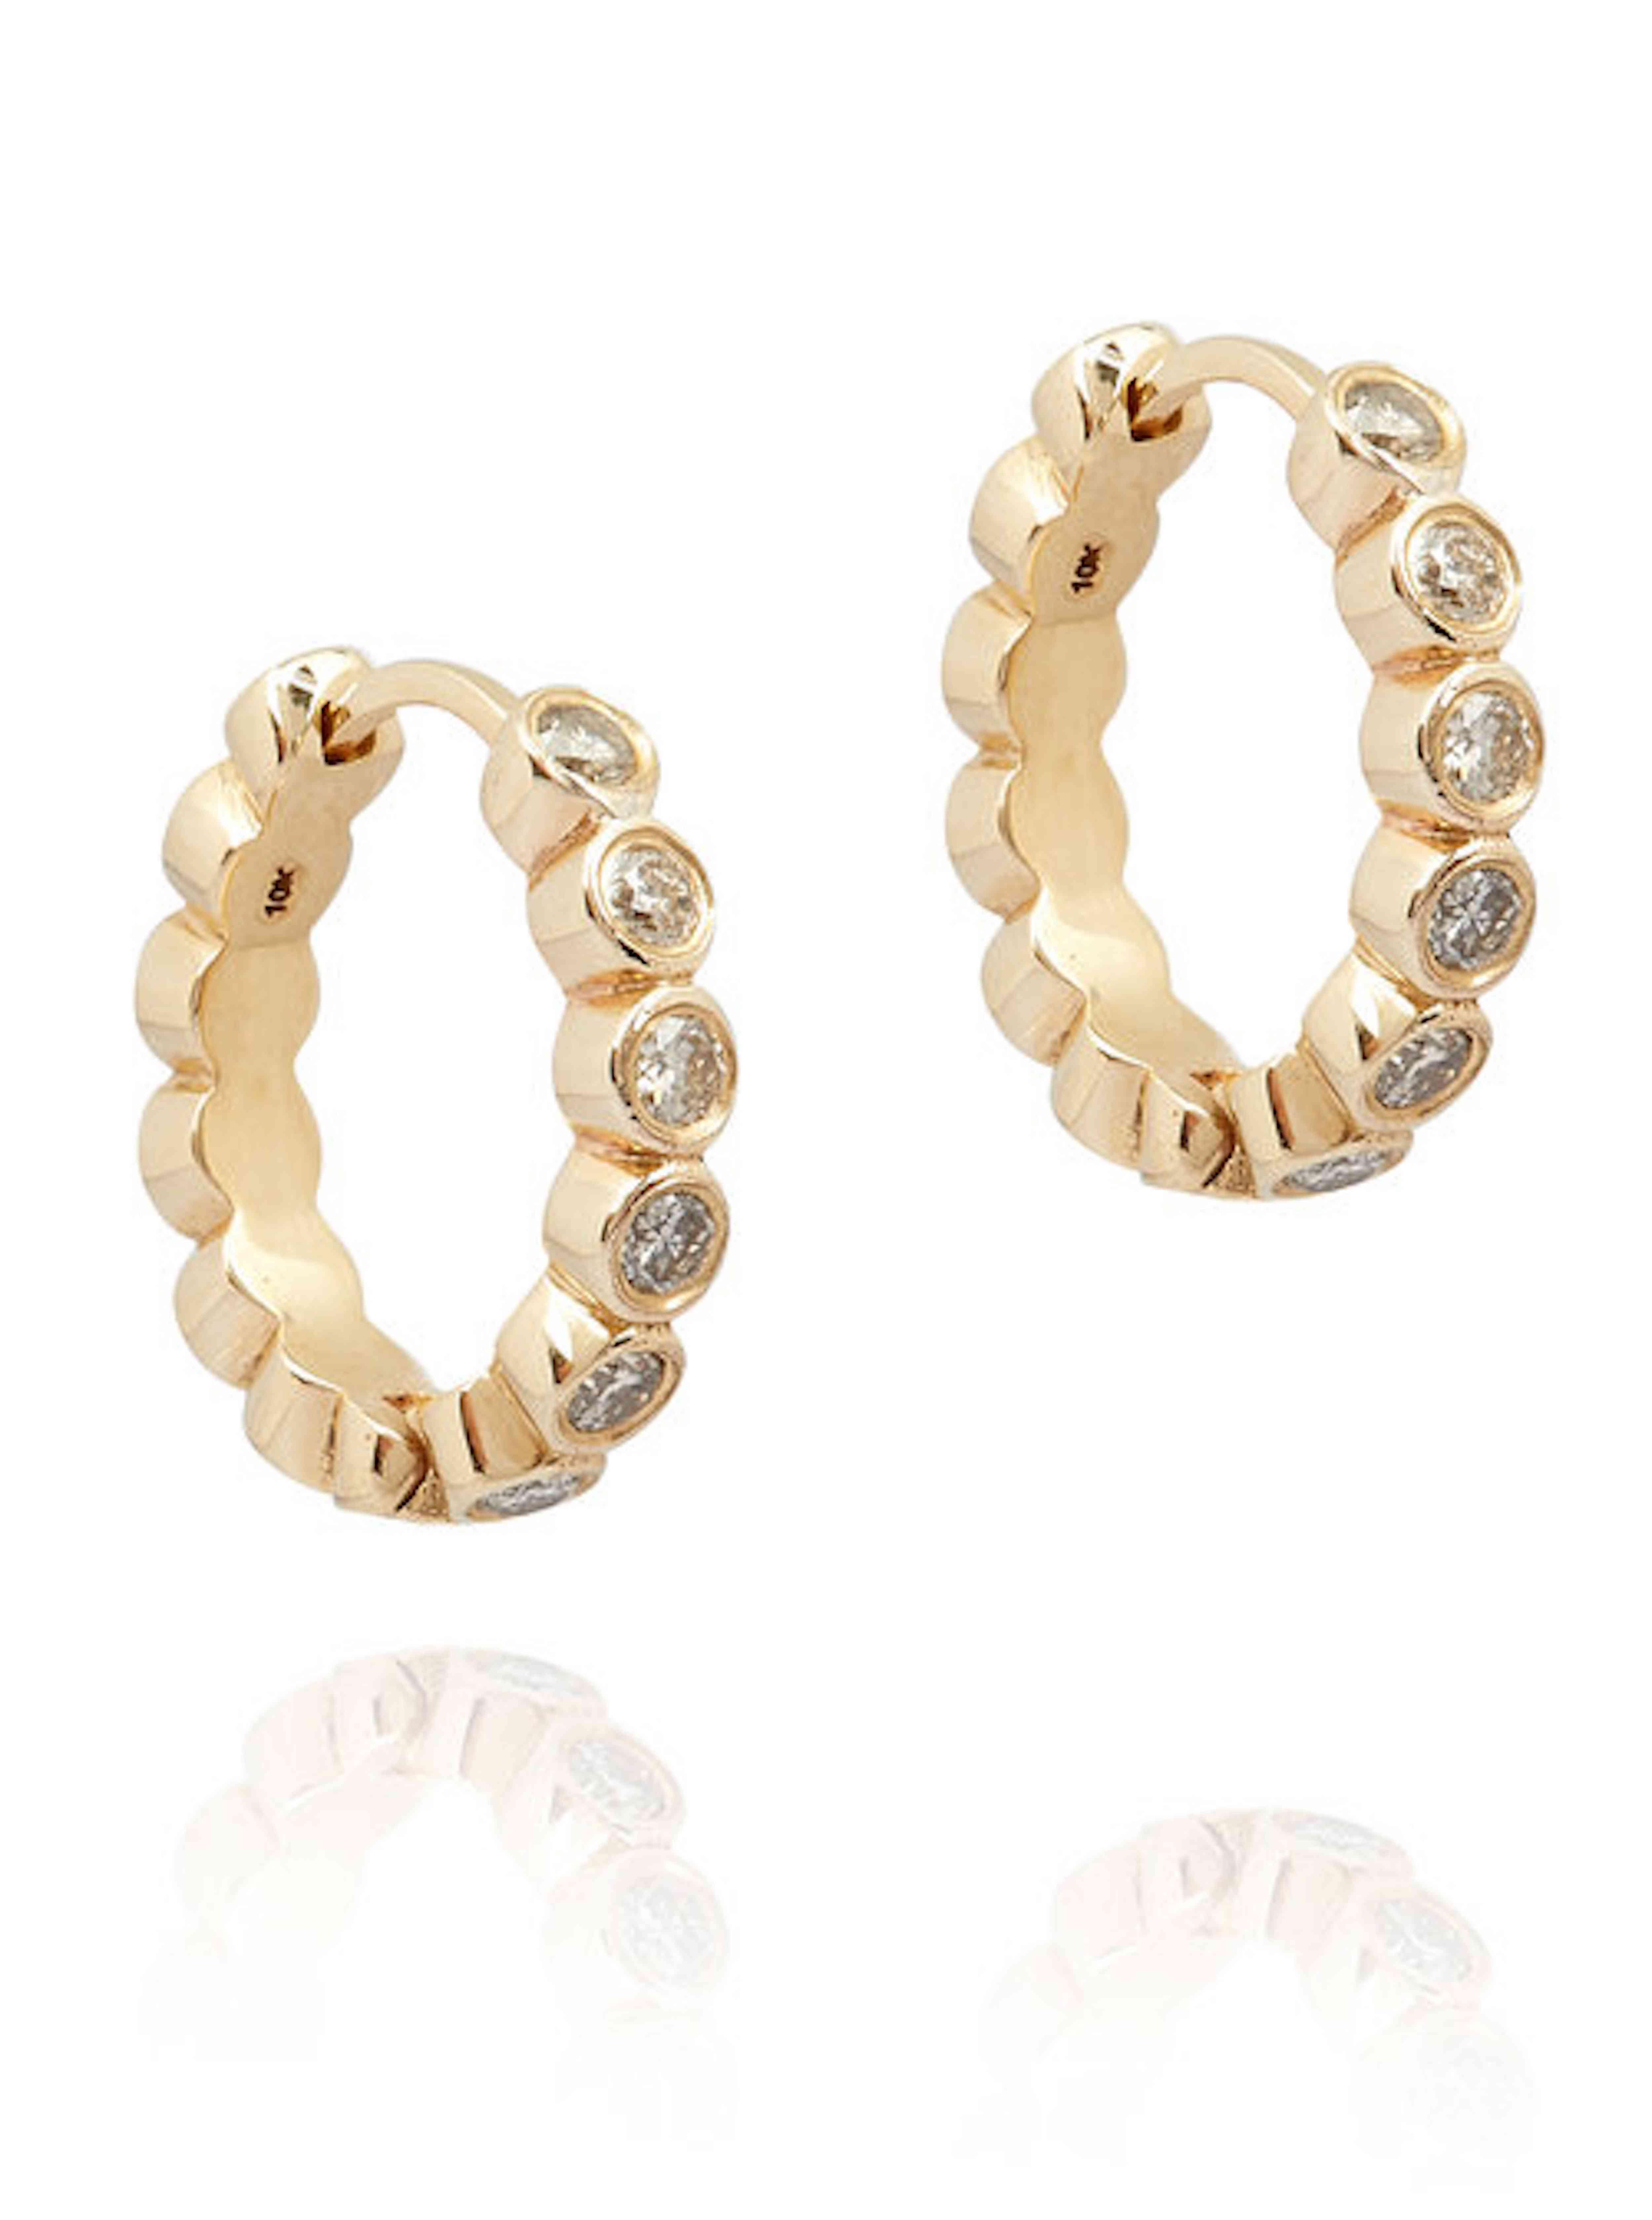 Theodore Ware 10K Gold and Diamond Hoop Earrings